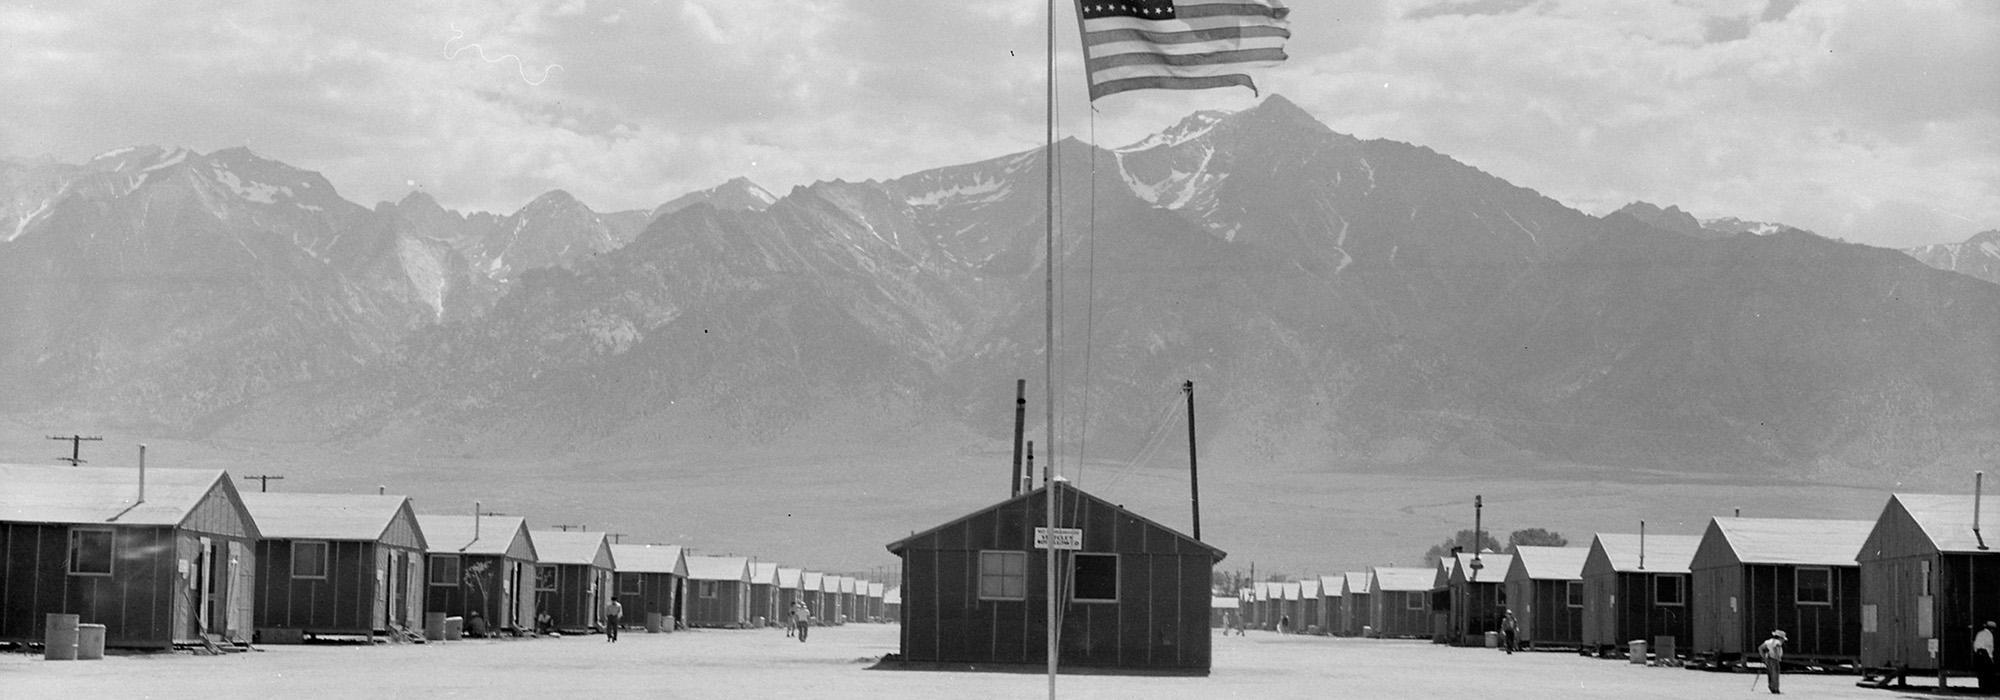 ManzanarCamp-hero.jpg